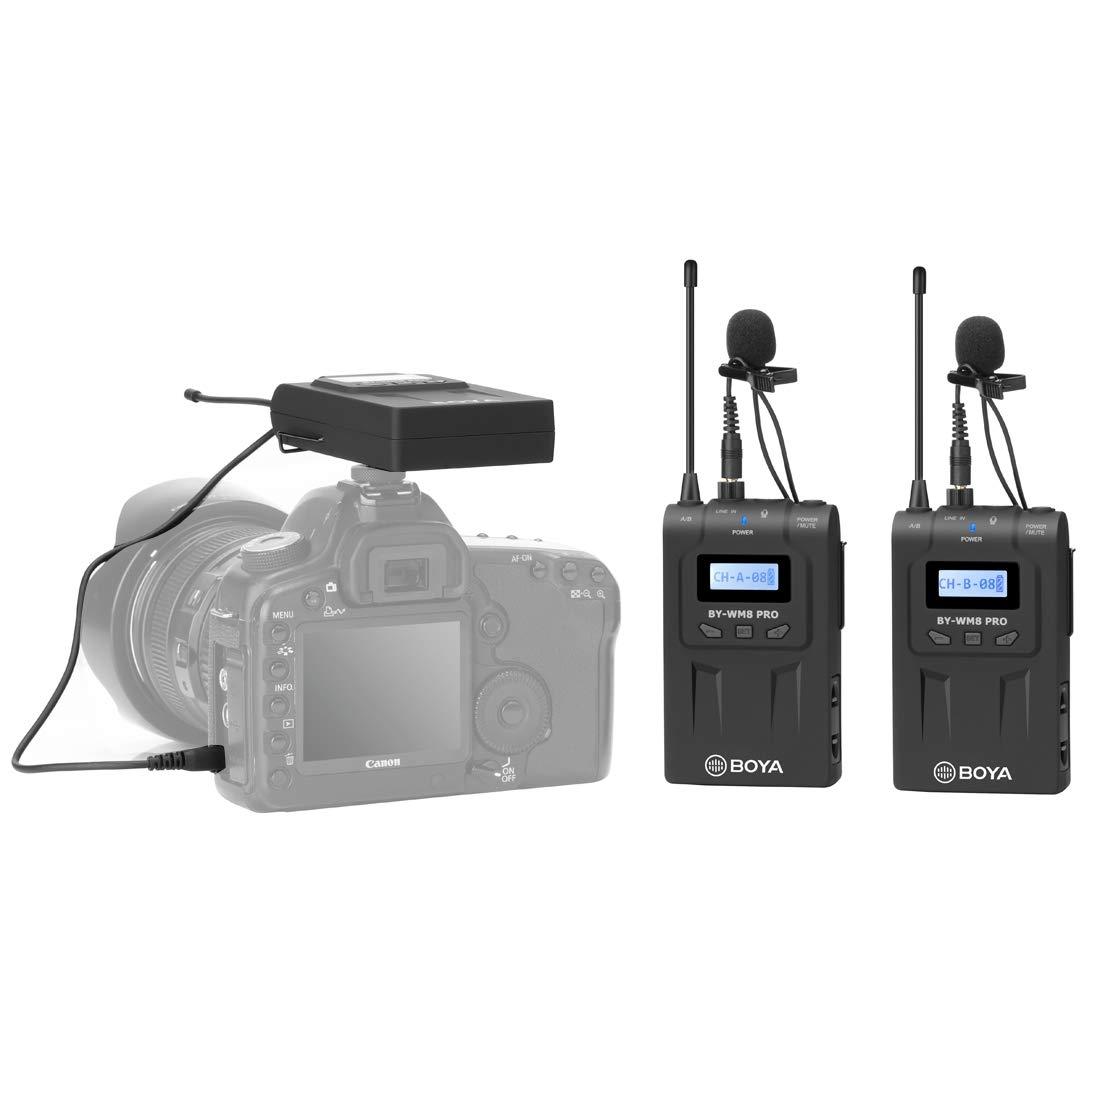 BOYA by WM8 Pro デュアルチャンネル 48CH UHF ワイヤレスマイクシステム 送信機と受信機付き デジタル一眼レフカメラとビデオカメラ用 (ブラック)   B07KNRFR3S